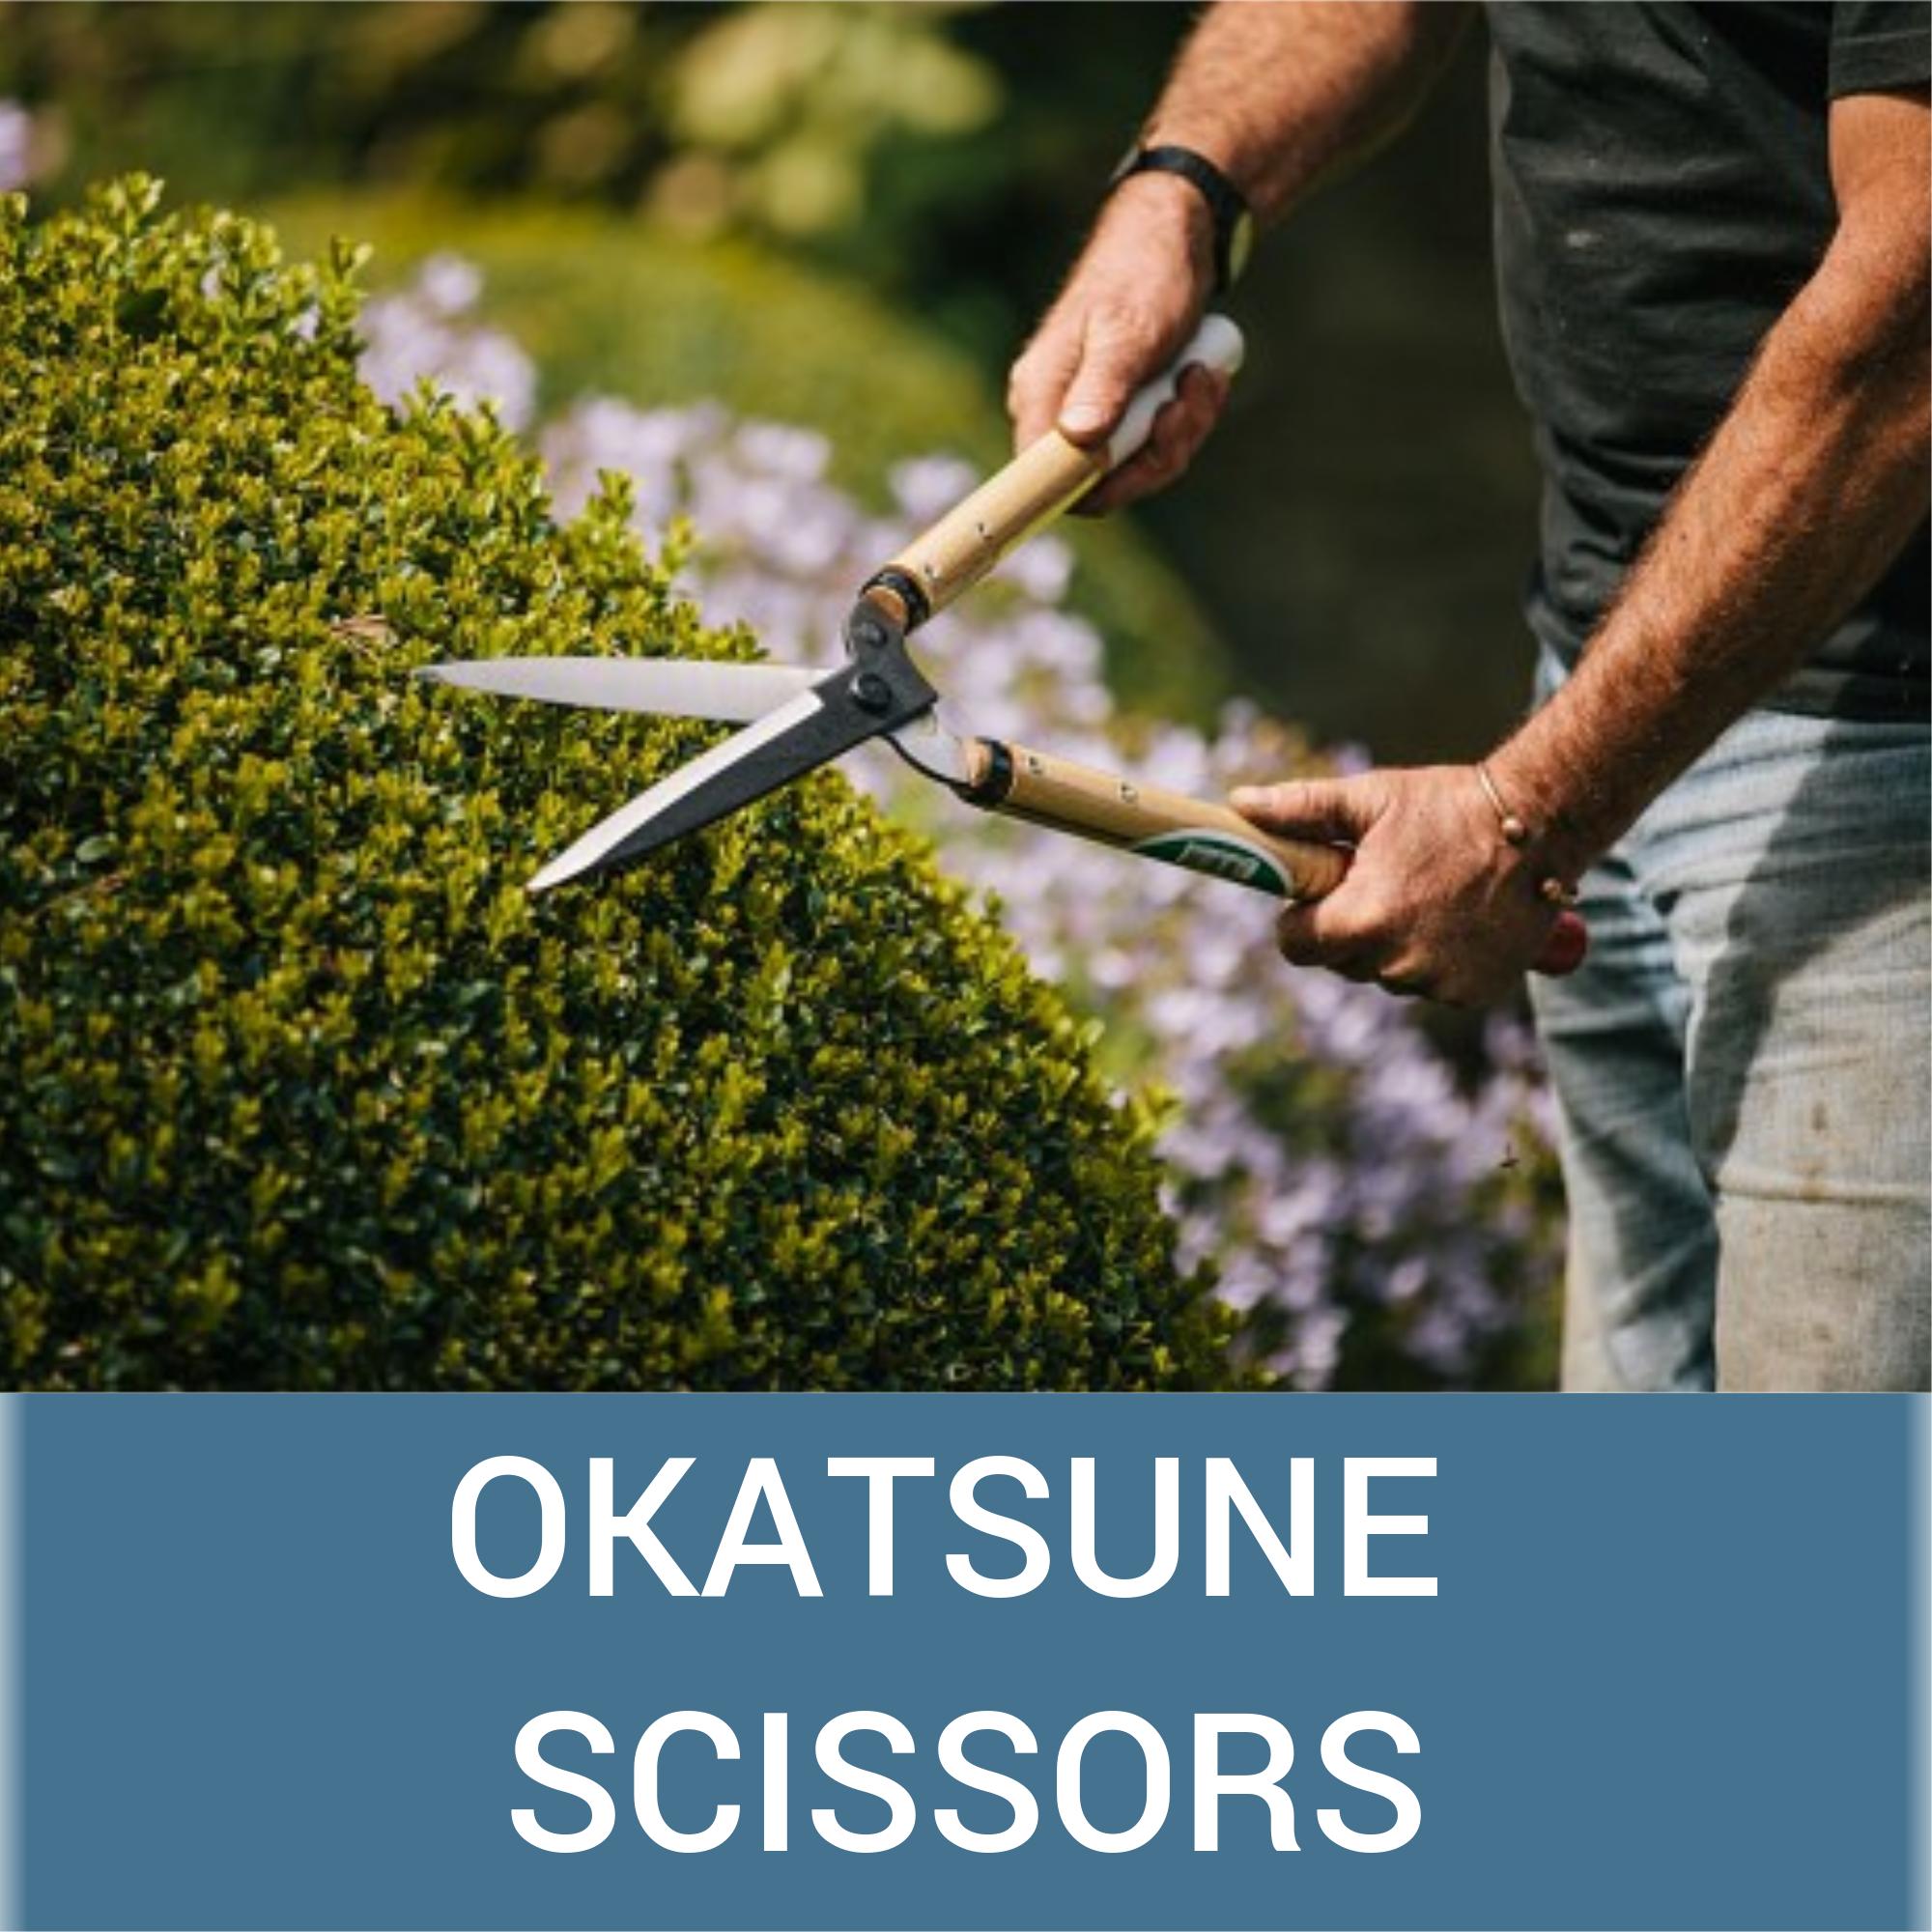 Okatsune Scissors